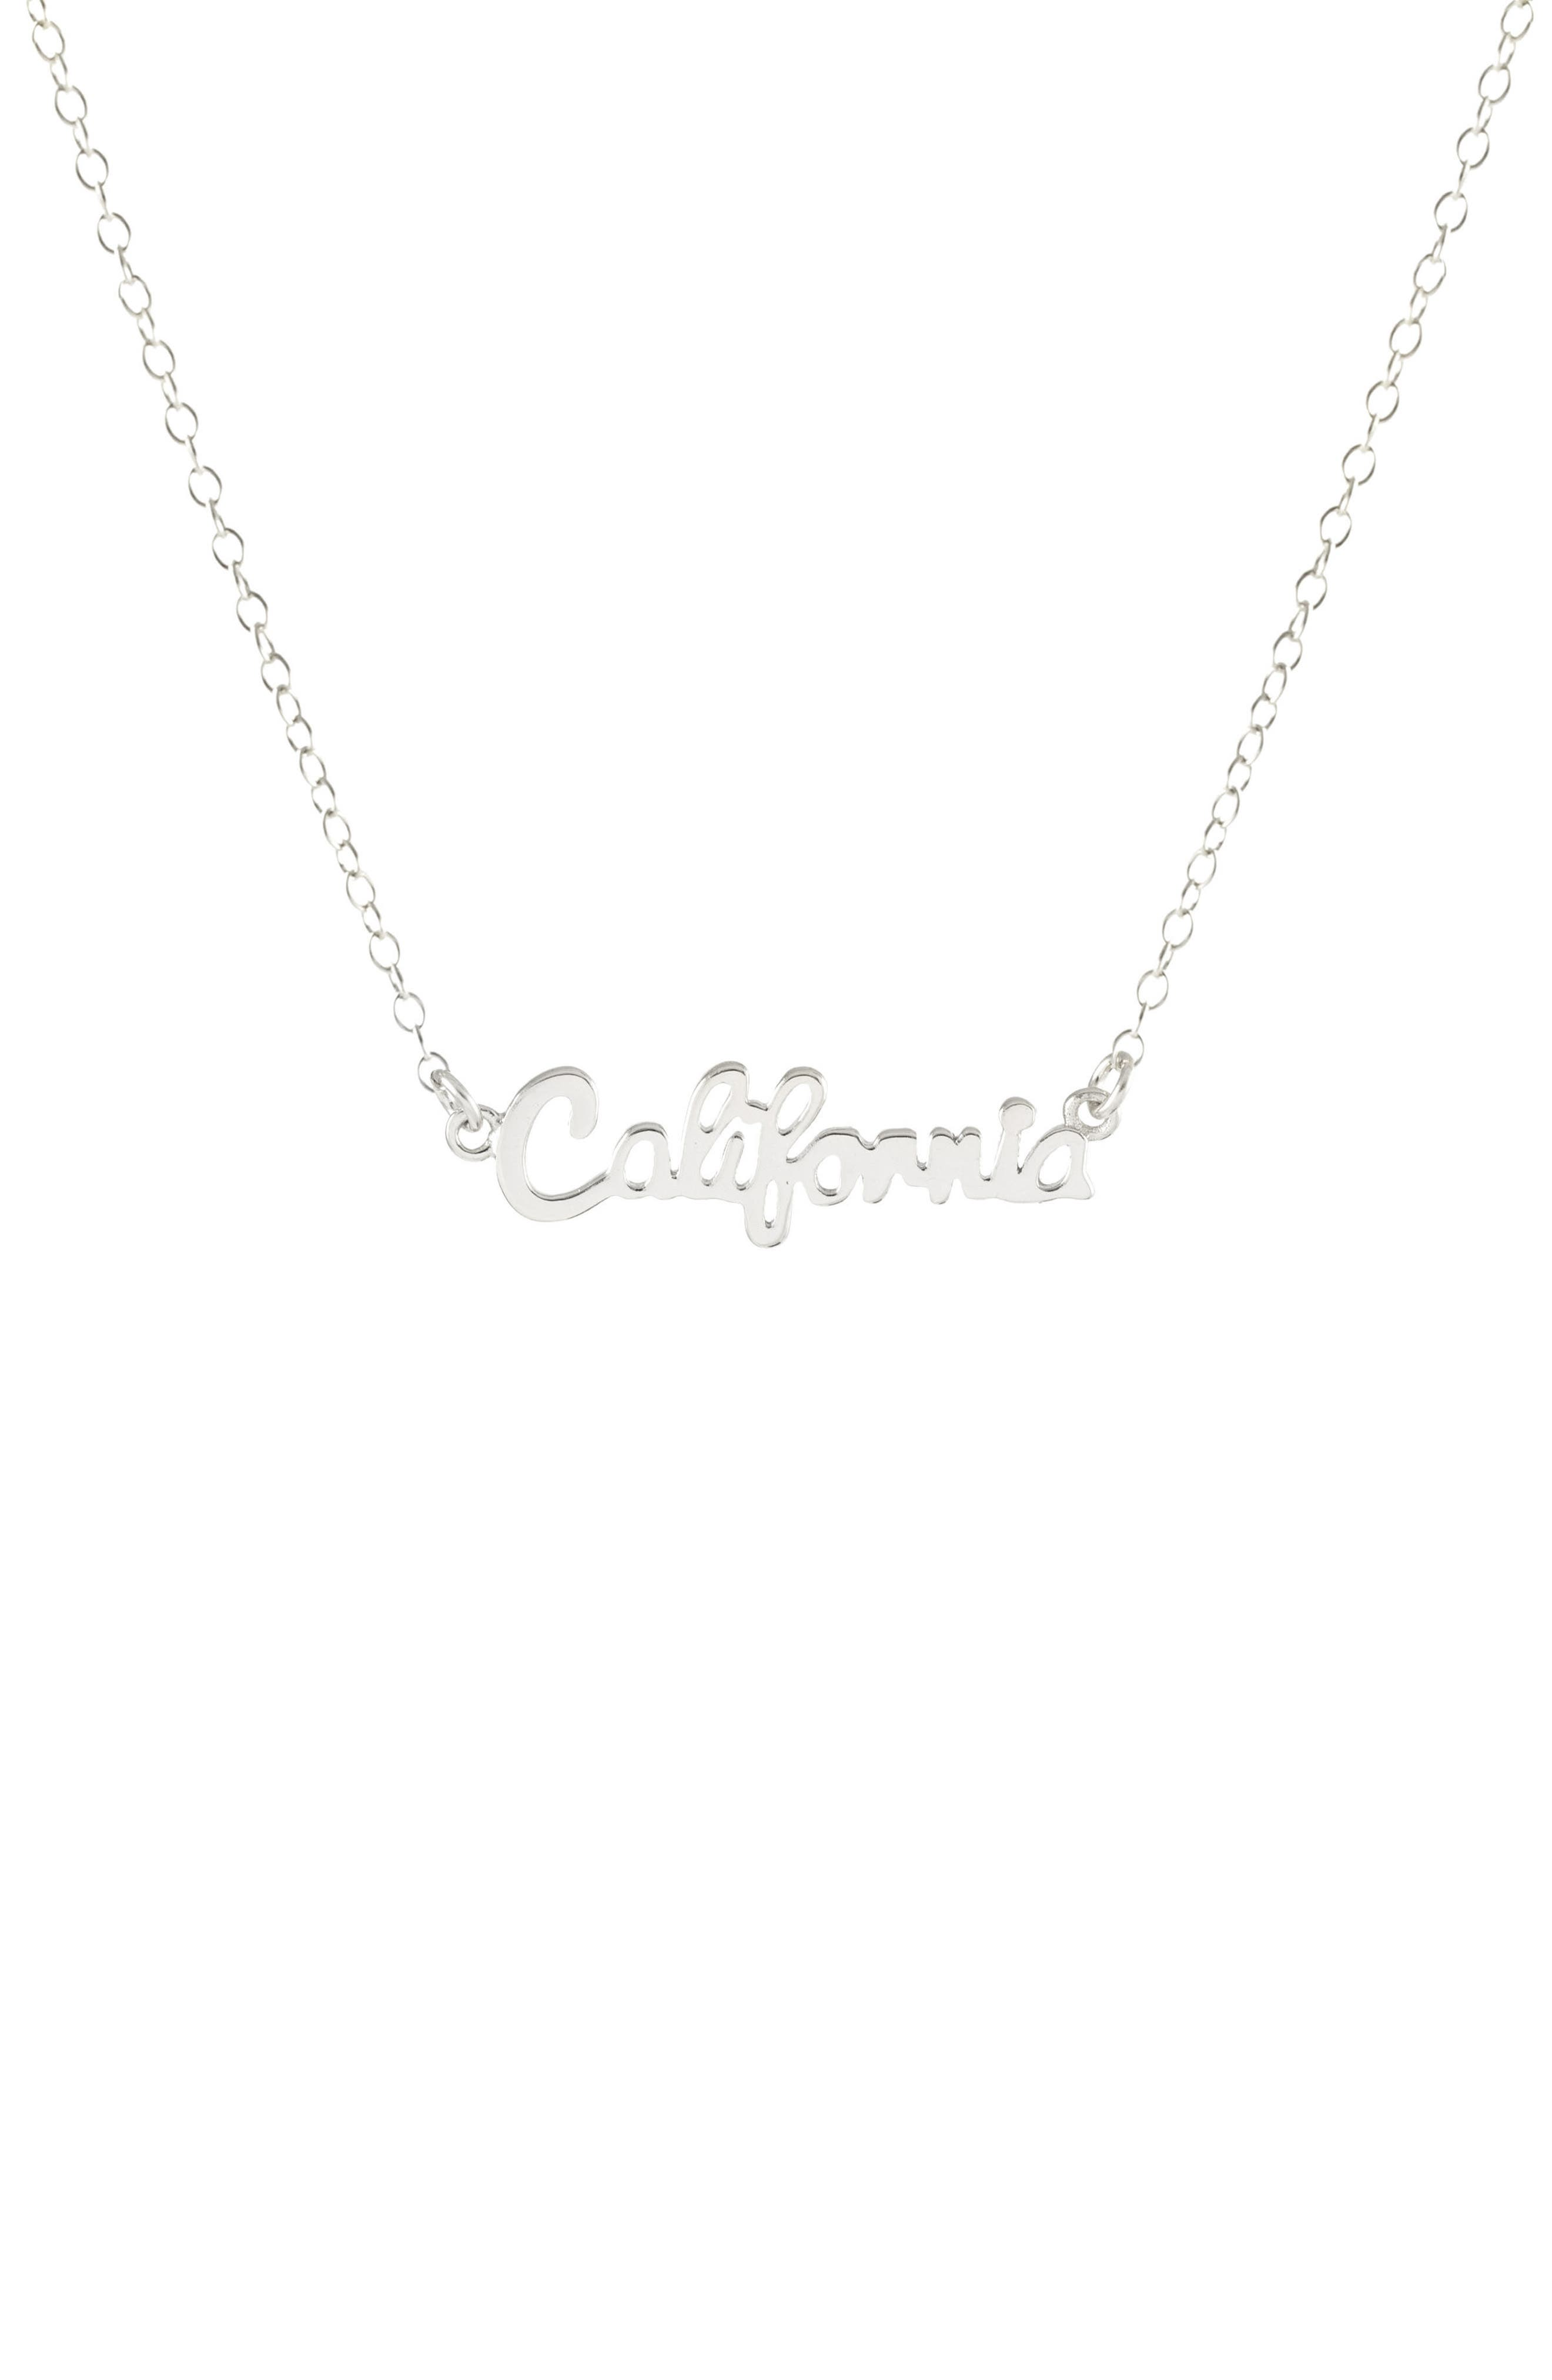 State Script Charm Necklace,                         Main,                         color, CALIFORNIA - SILVER